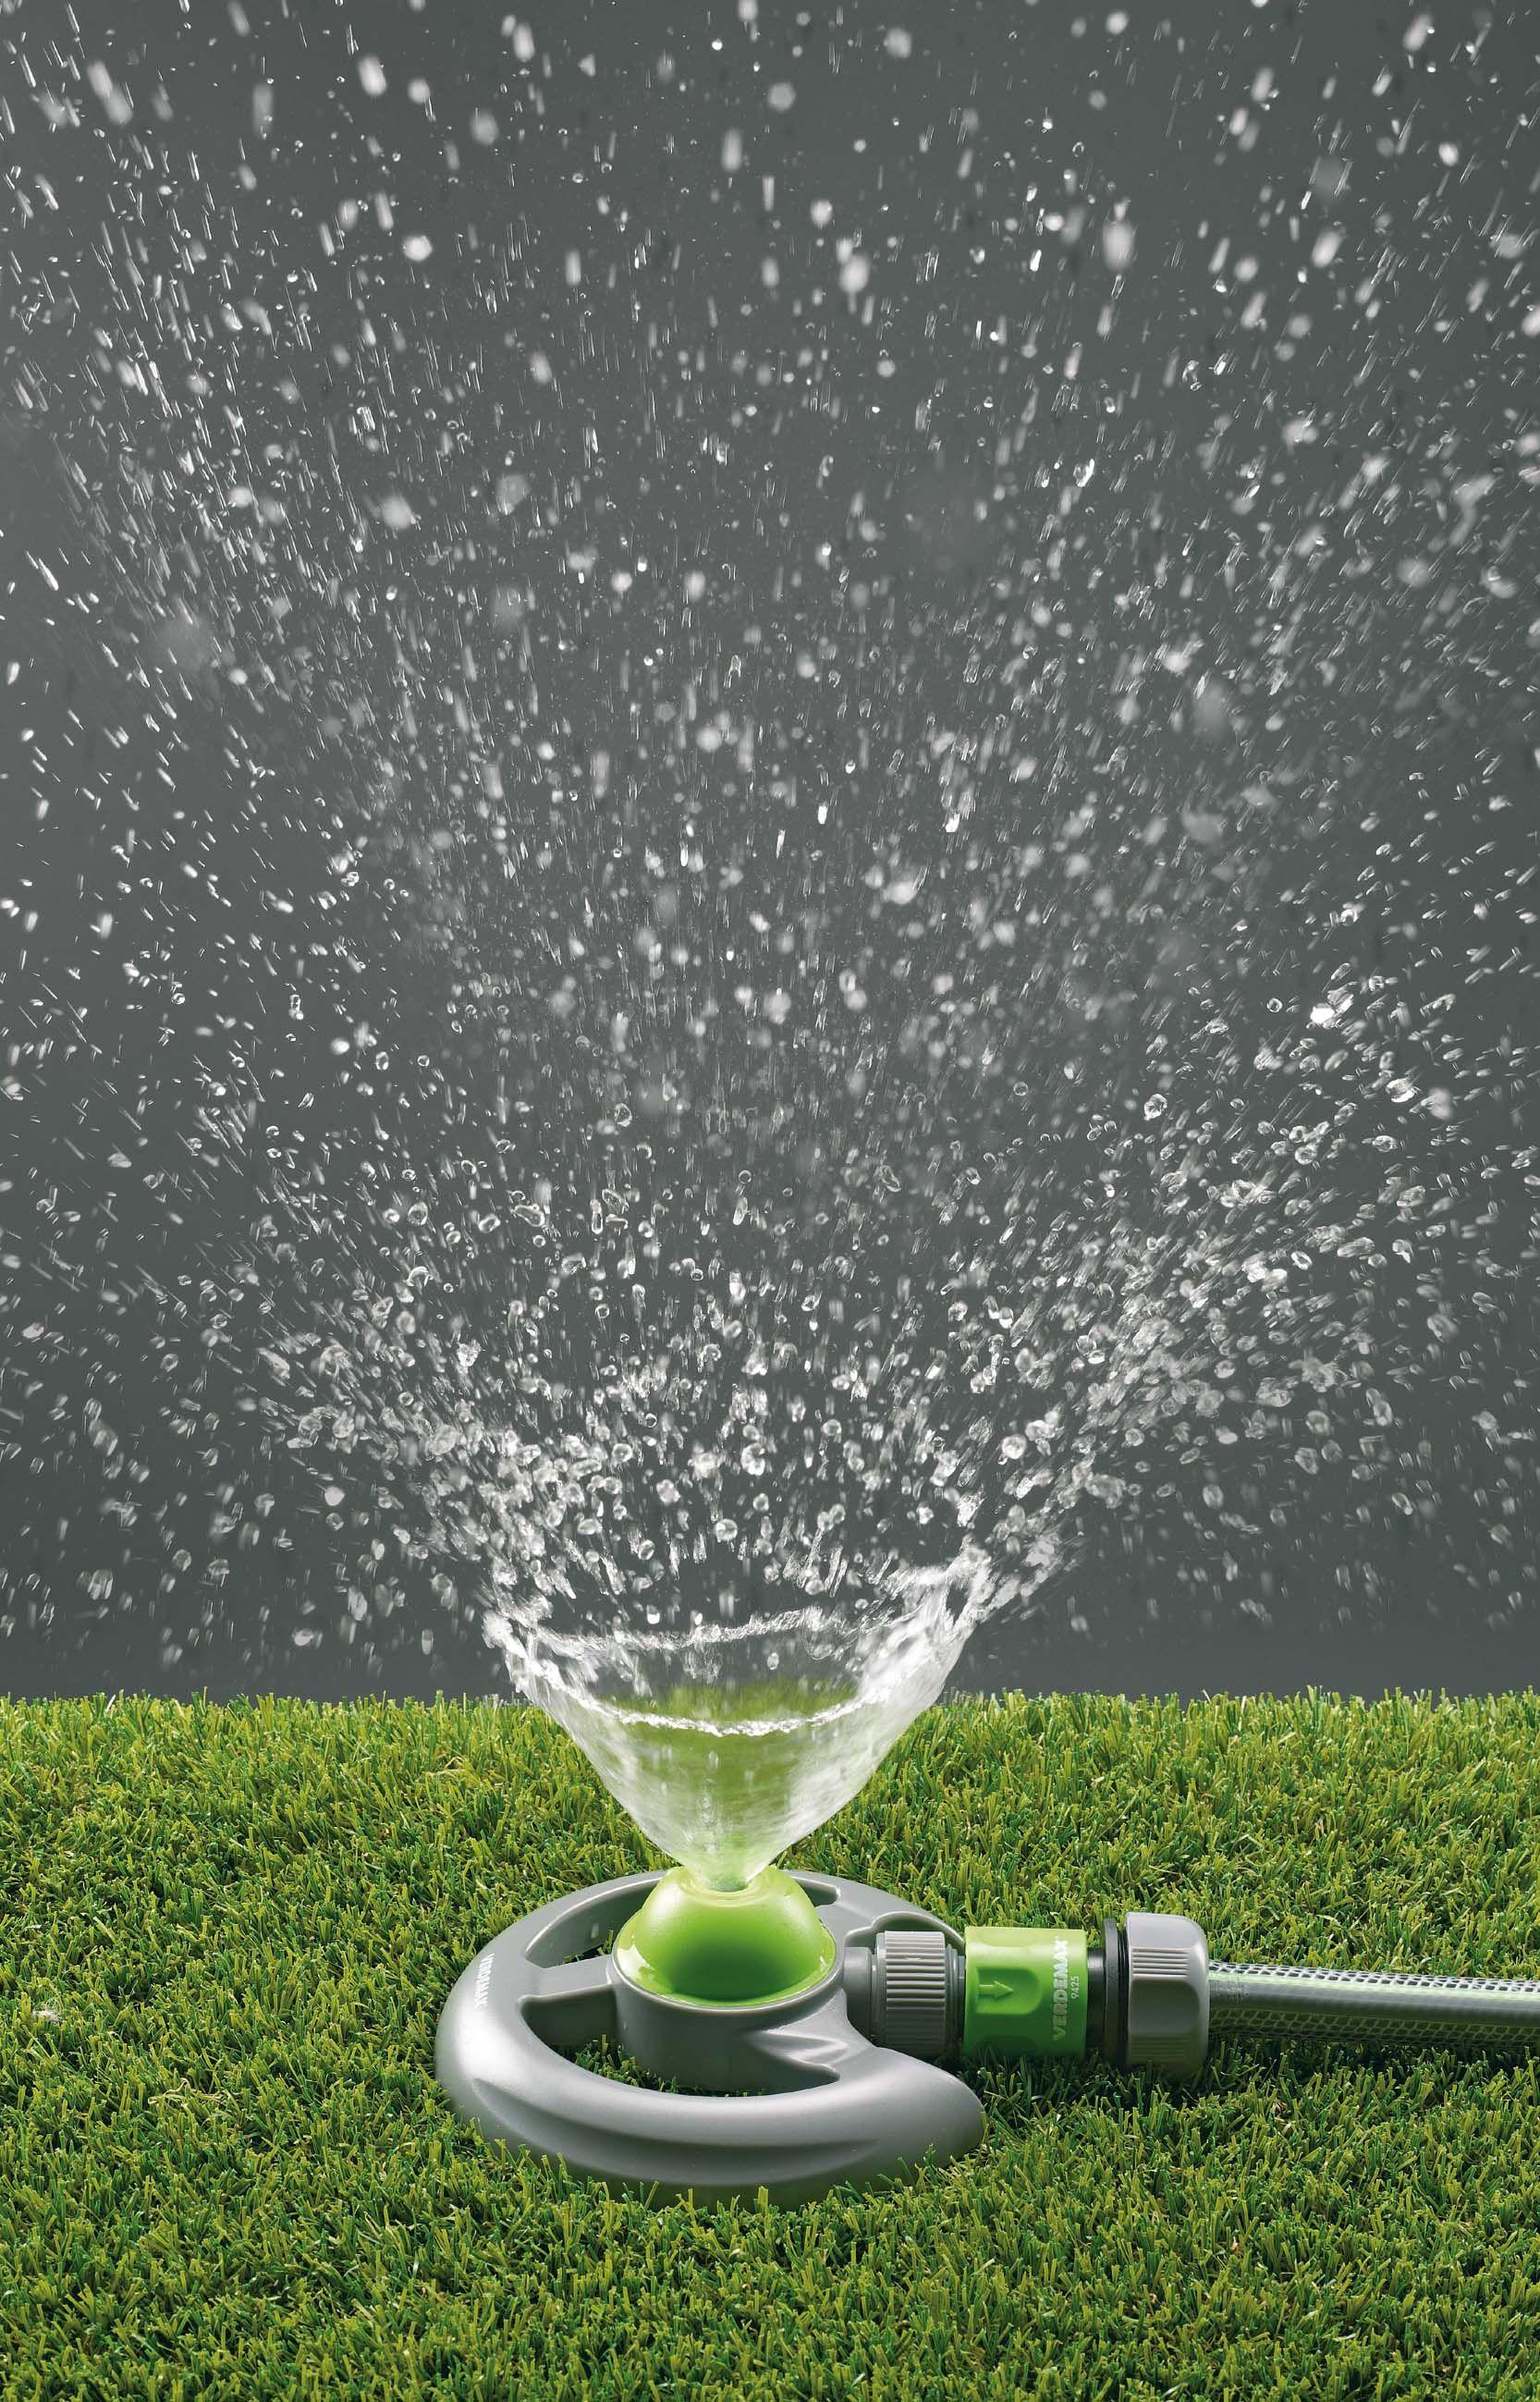 Regolabile oscillante Sprinkler su base IRRIGAZIONE GIARDINO PRATO TUBO DI RACCORDO